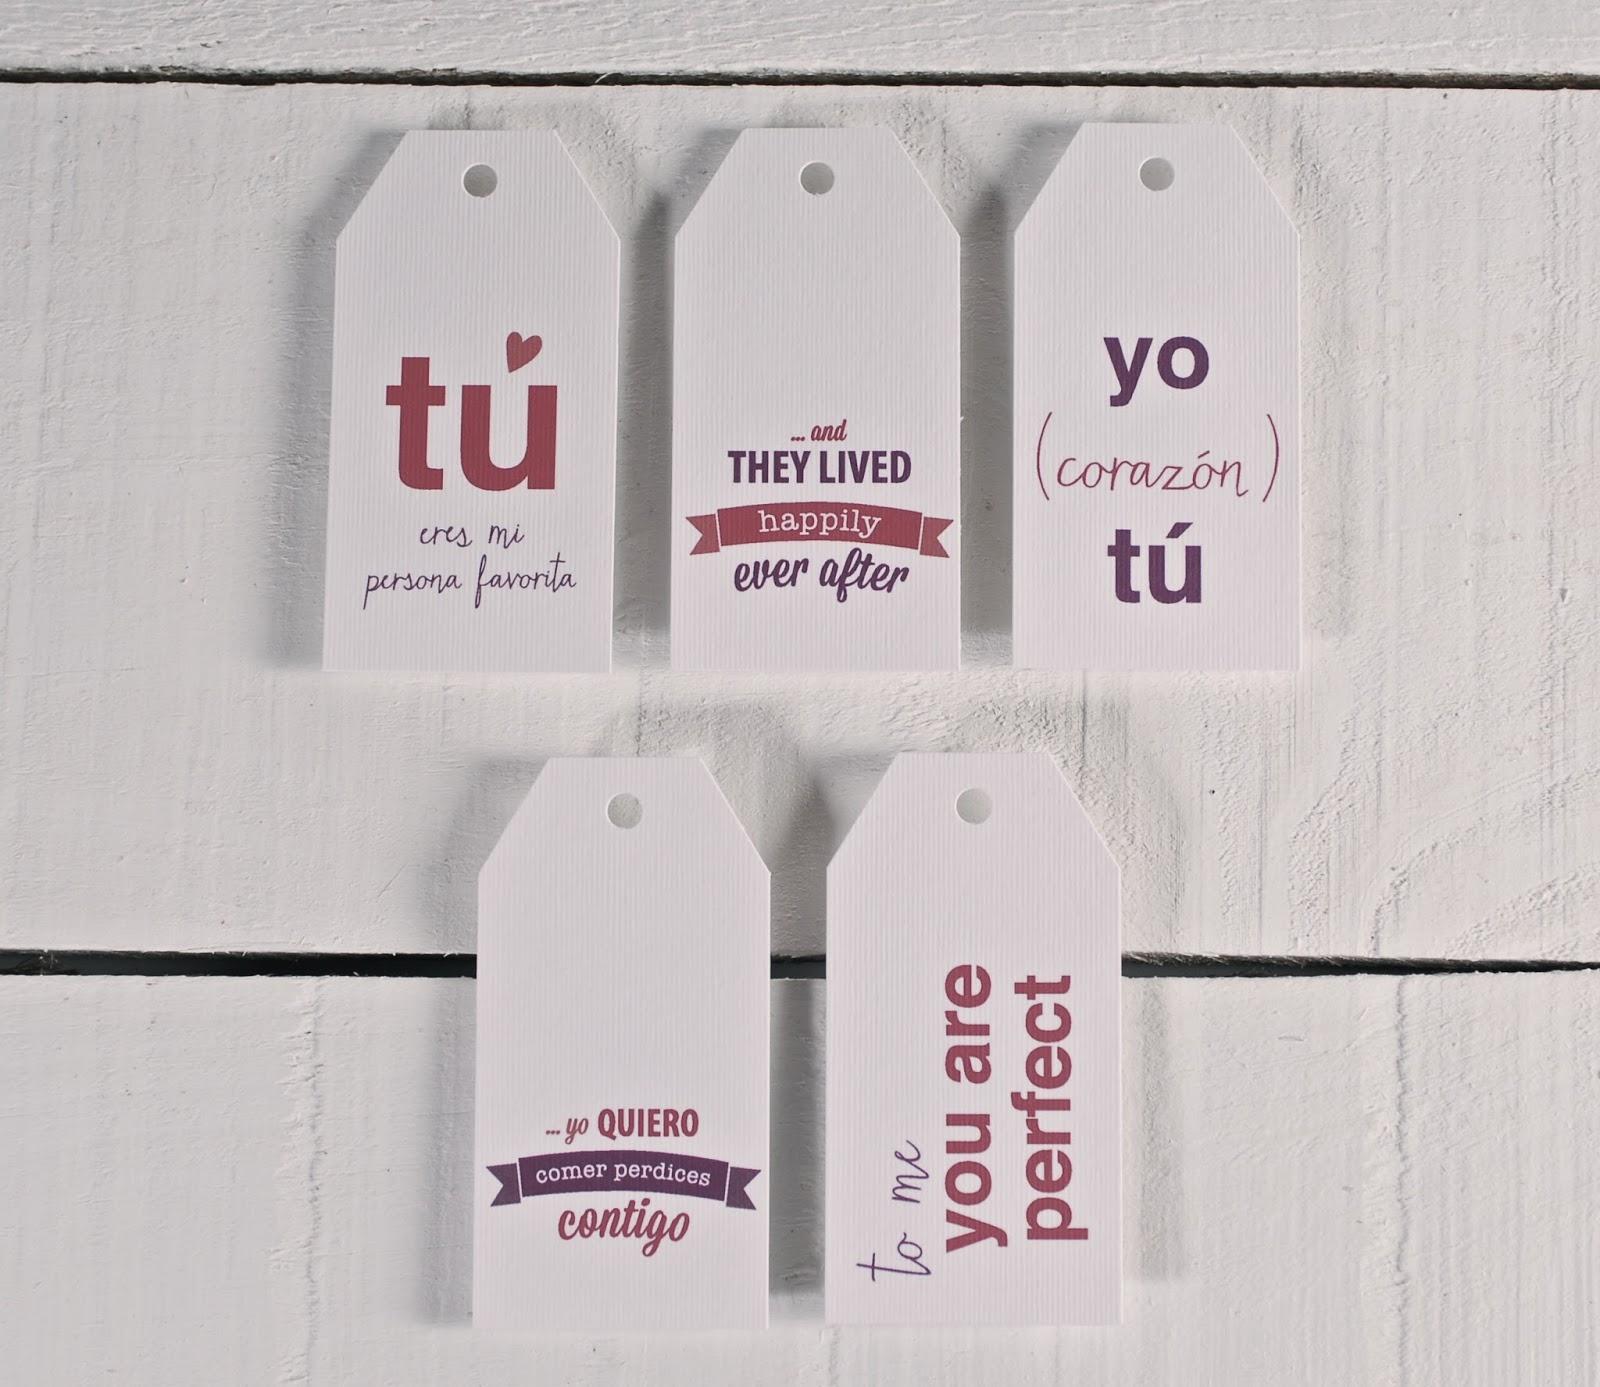 etiquetas impresas, etiquetas de regalo impresas, frases de amor, etiquetas impresas con frases de amor, etiquetas de amor, ideas para san valentín, san valentín